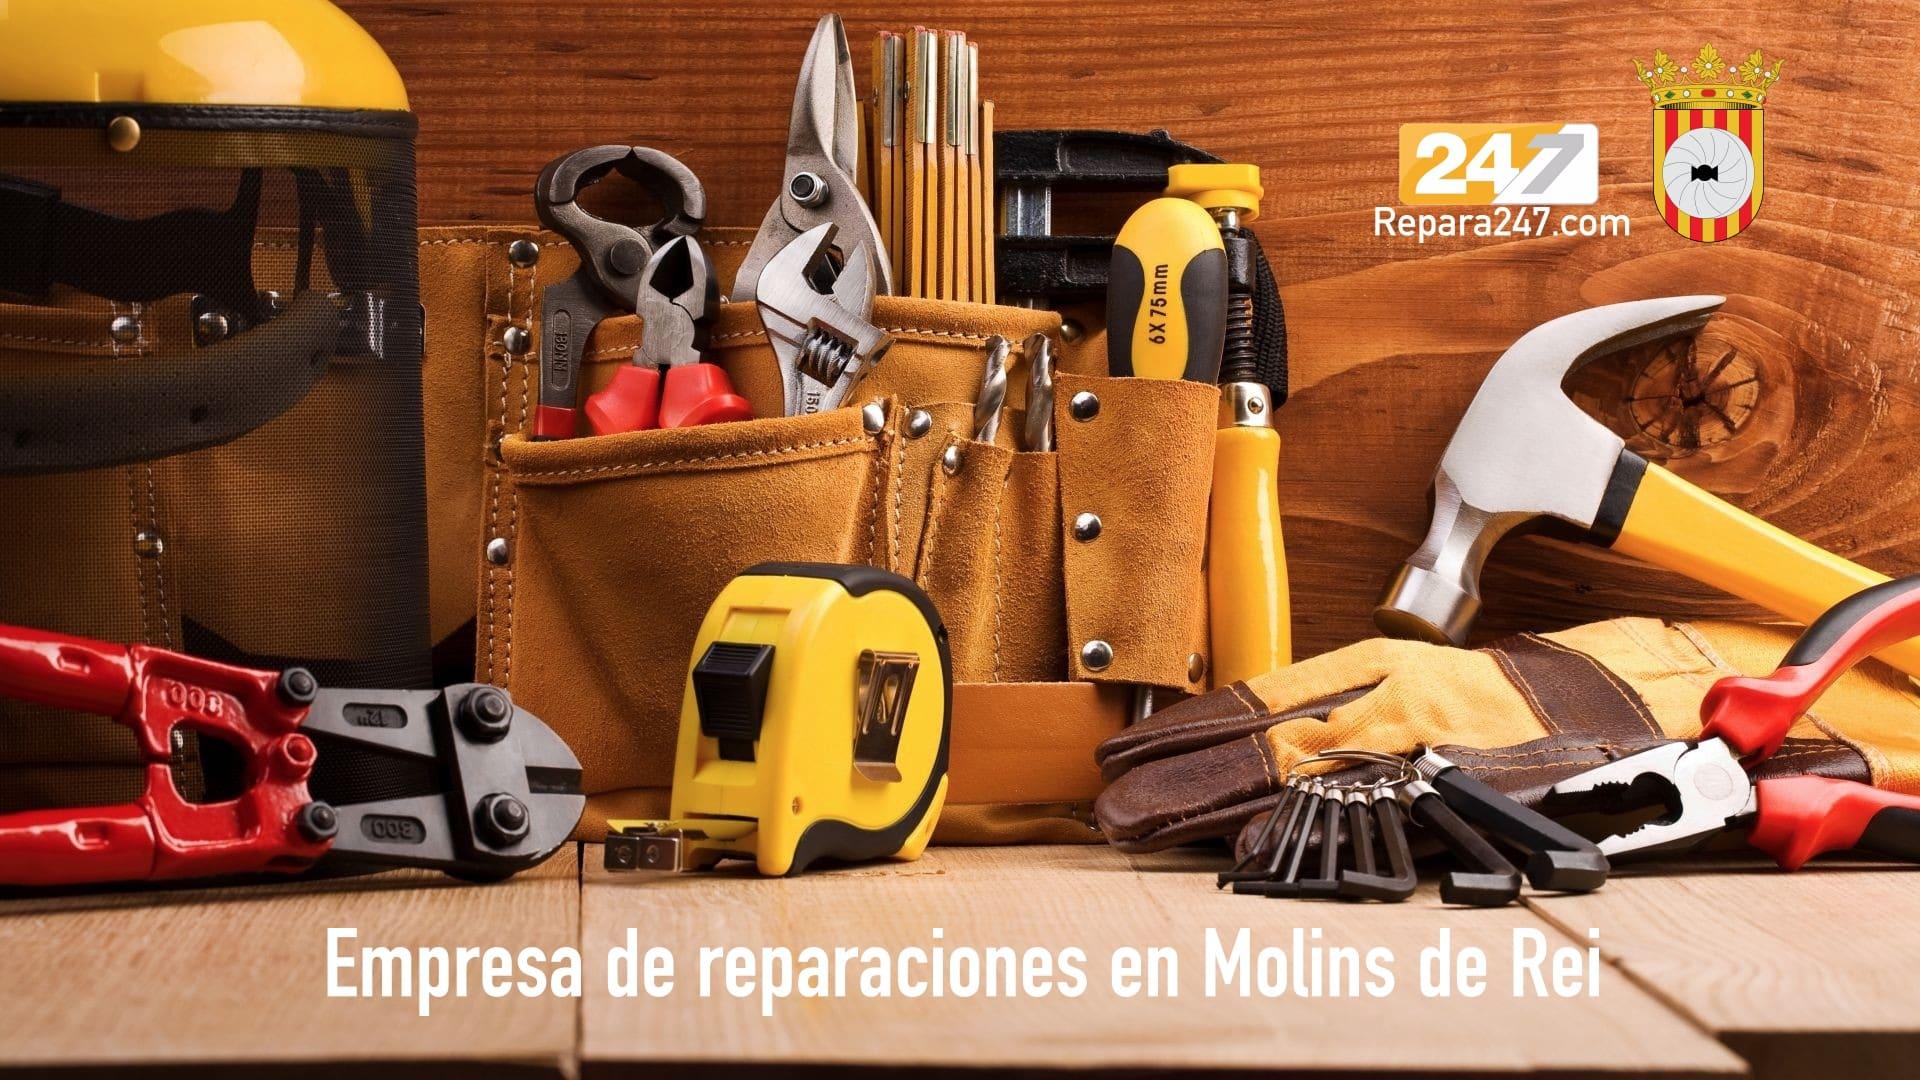 Empresa de reparaciones en Molins de Rei